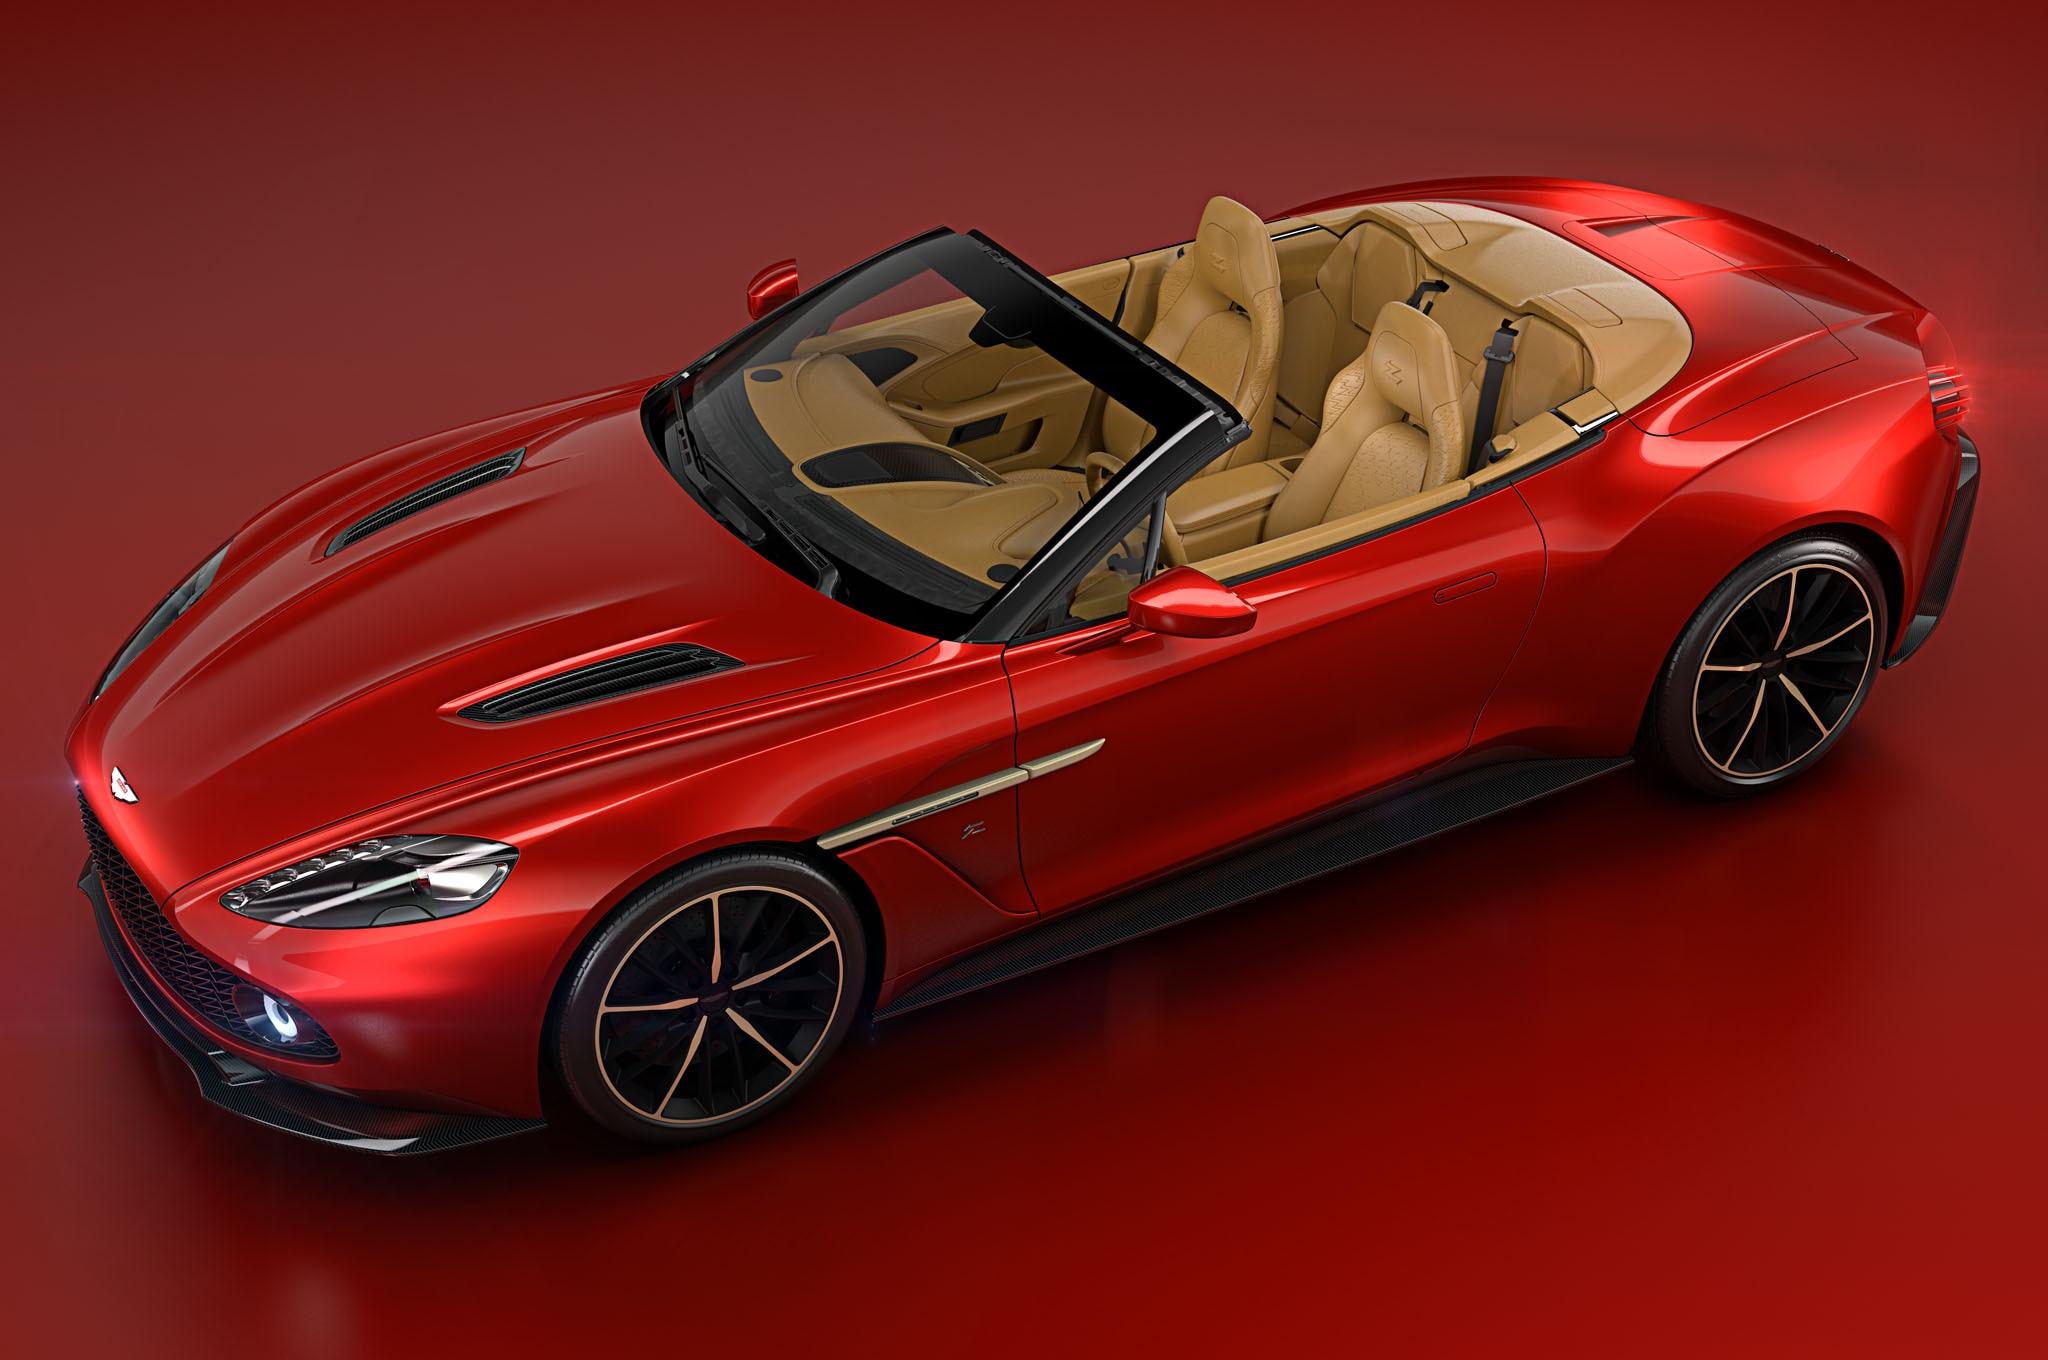 Aston Martin Vanquish Zagato Volante Front Three Quarter View